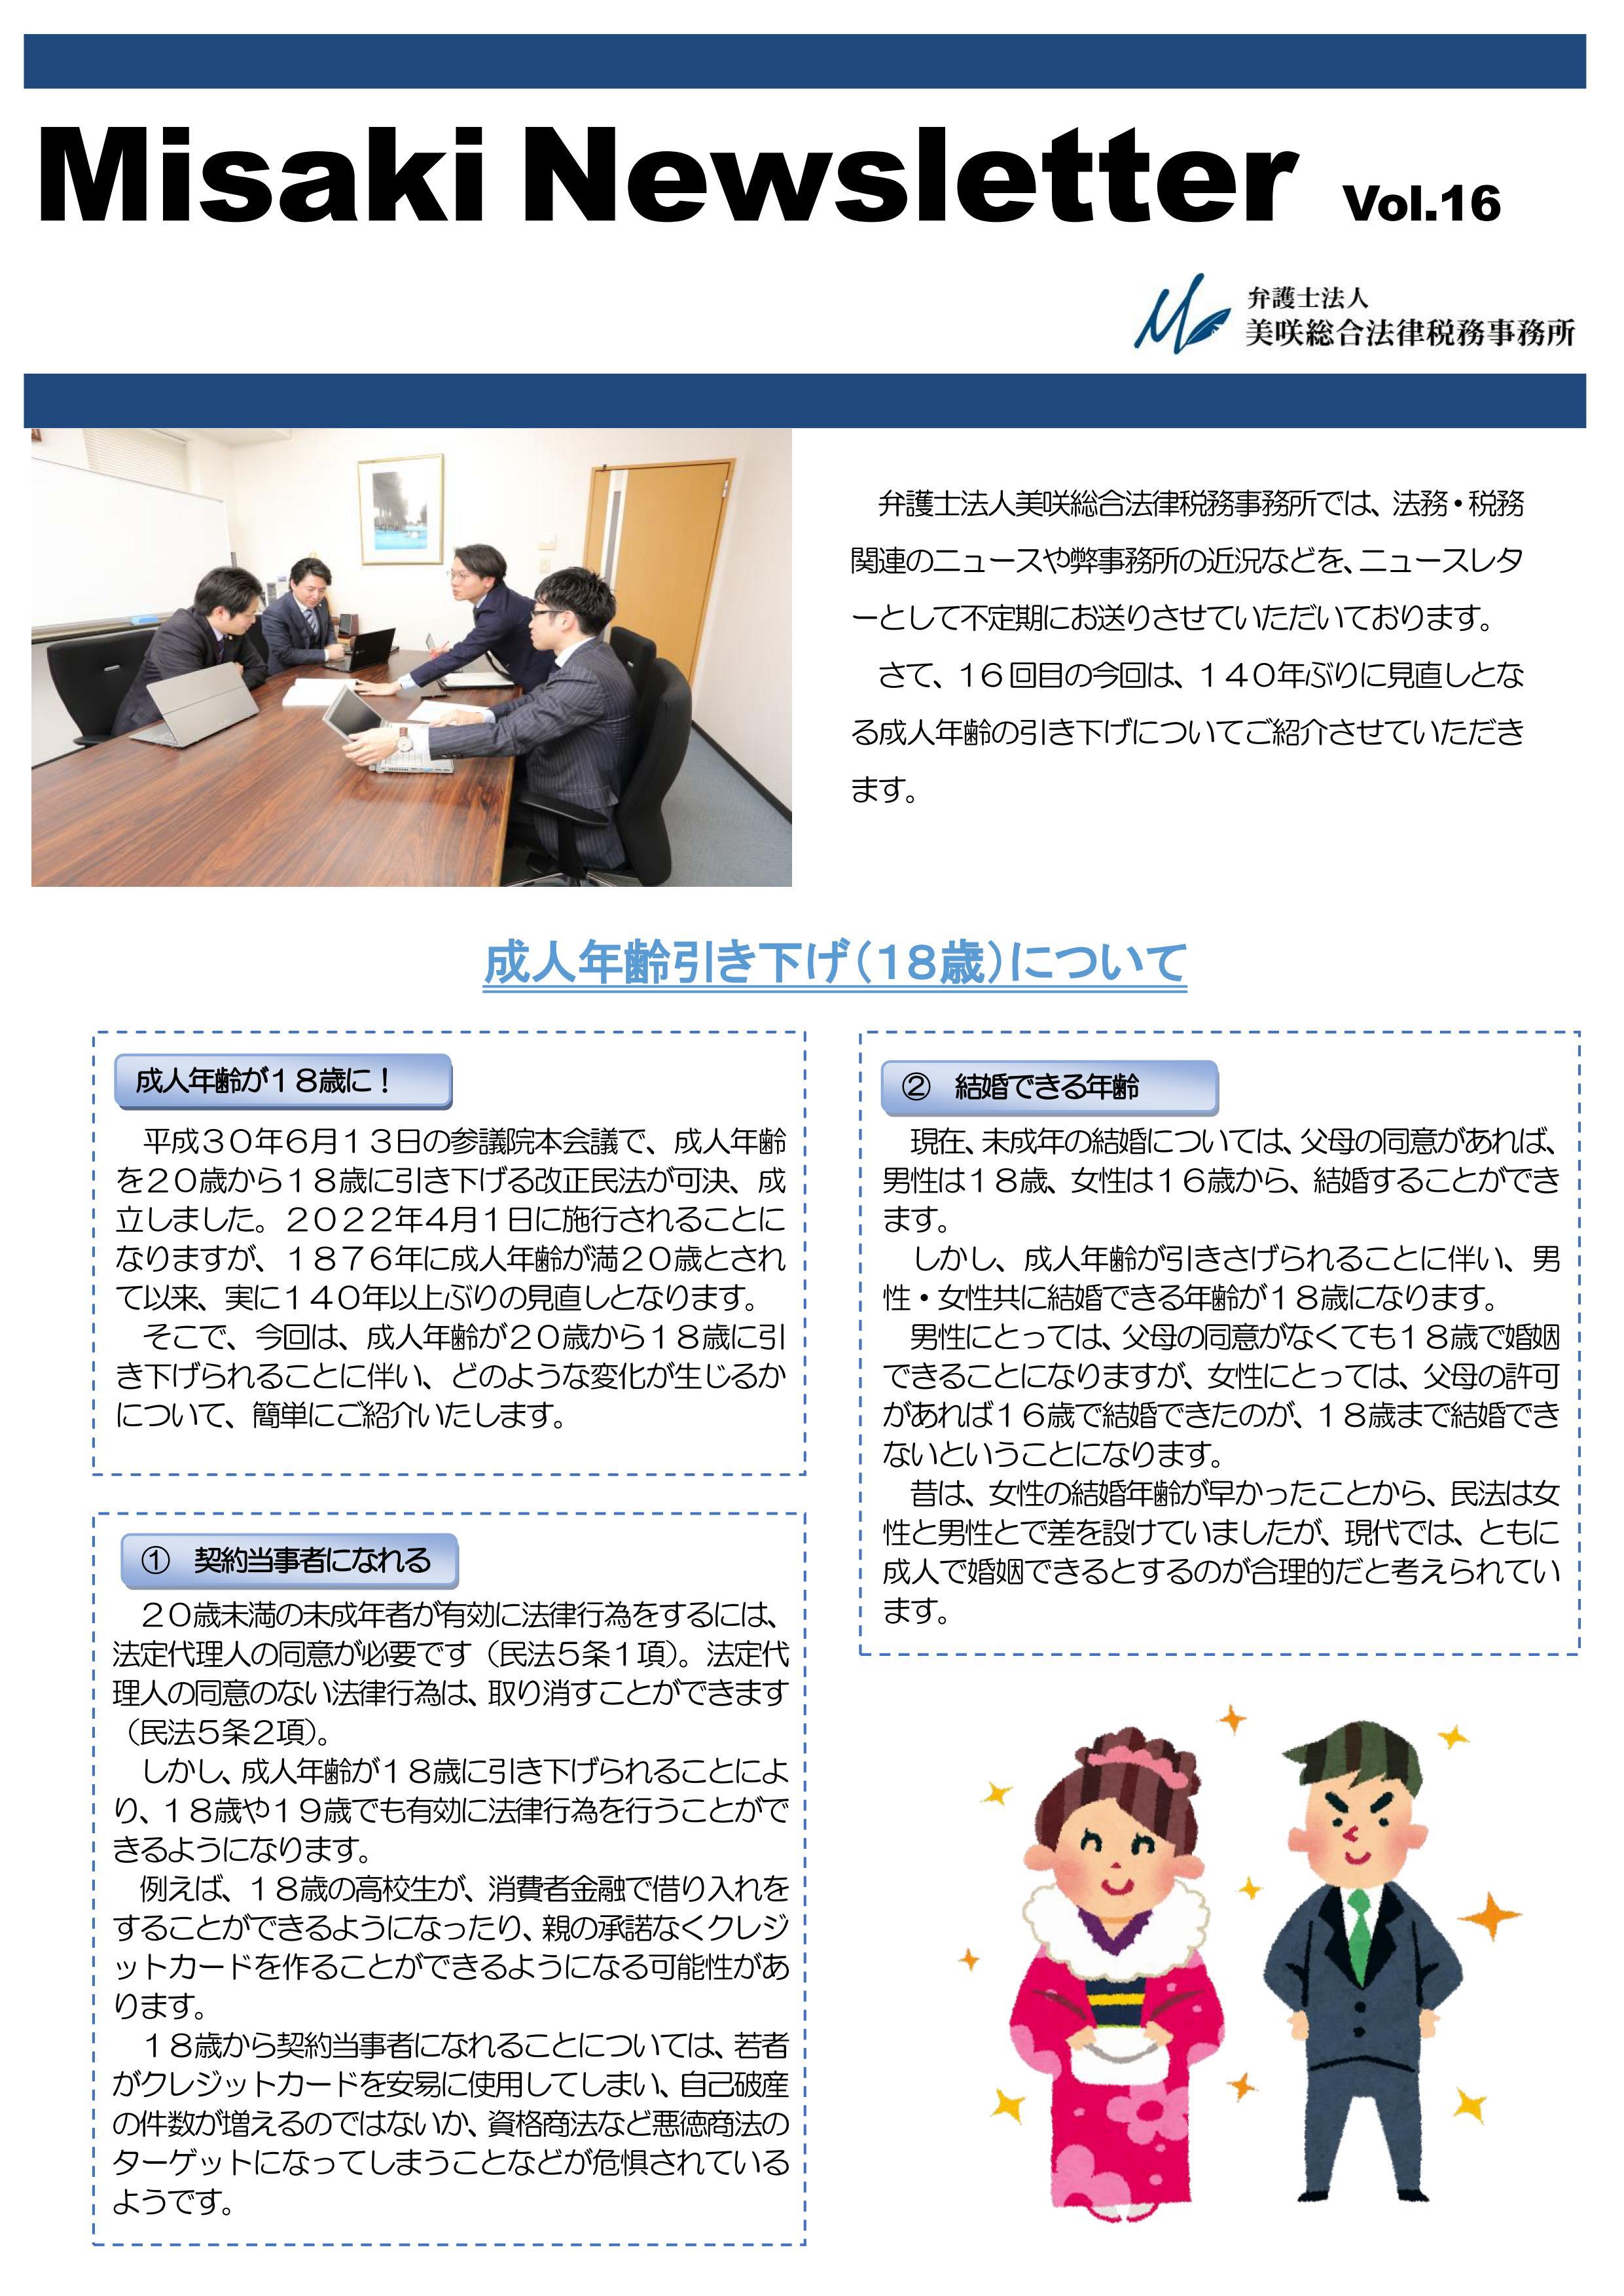 H300806 ニュースレター Vol.16_01.jpg